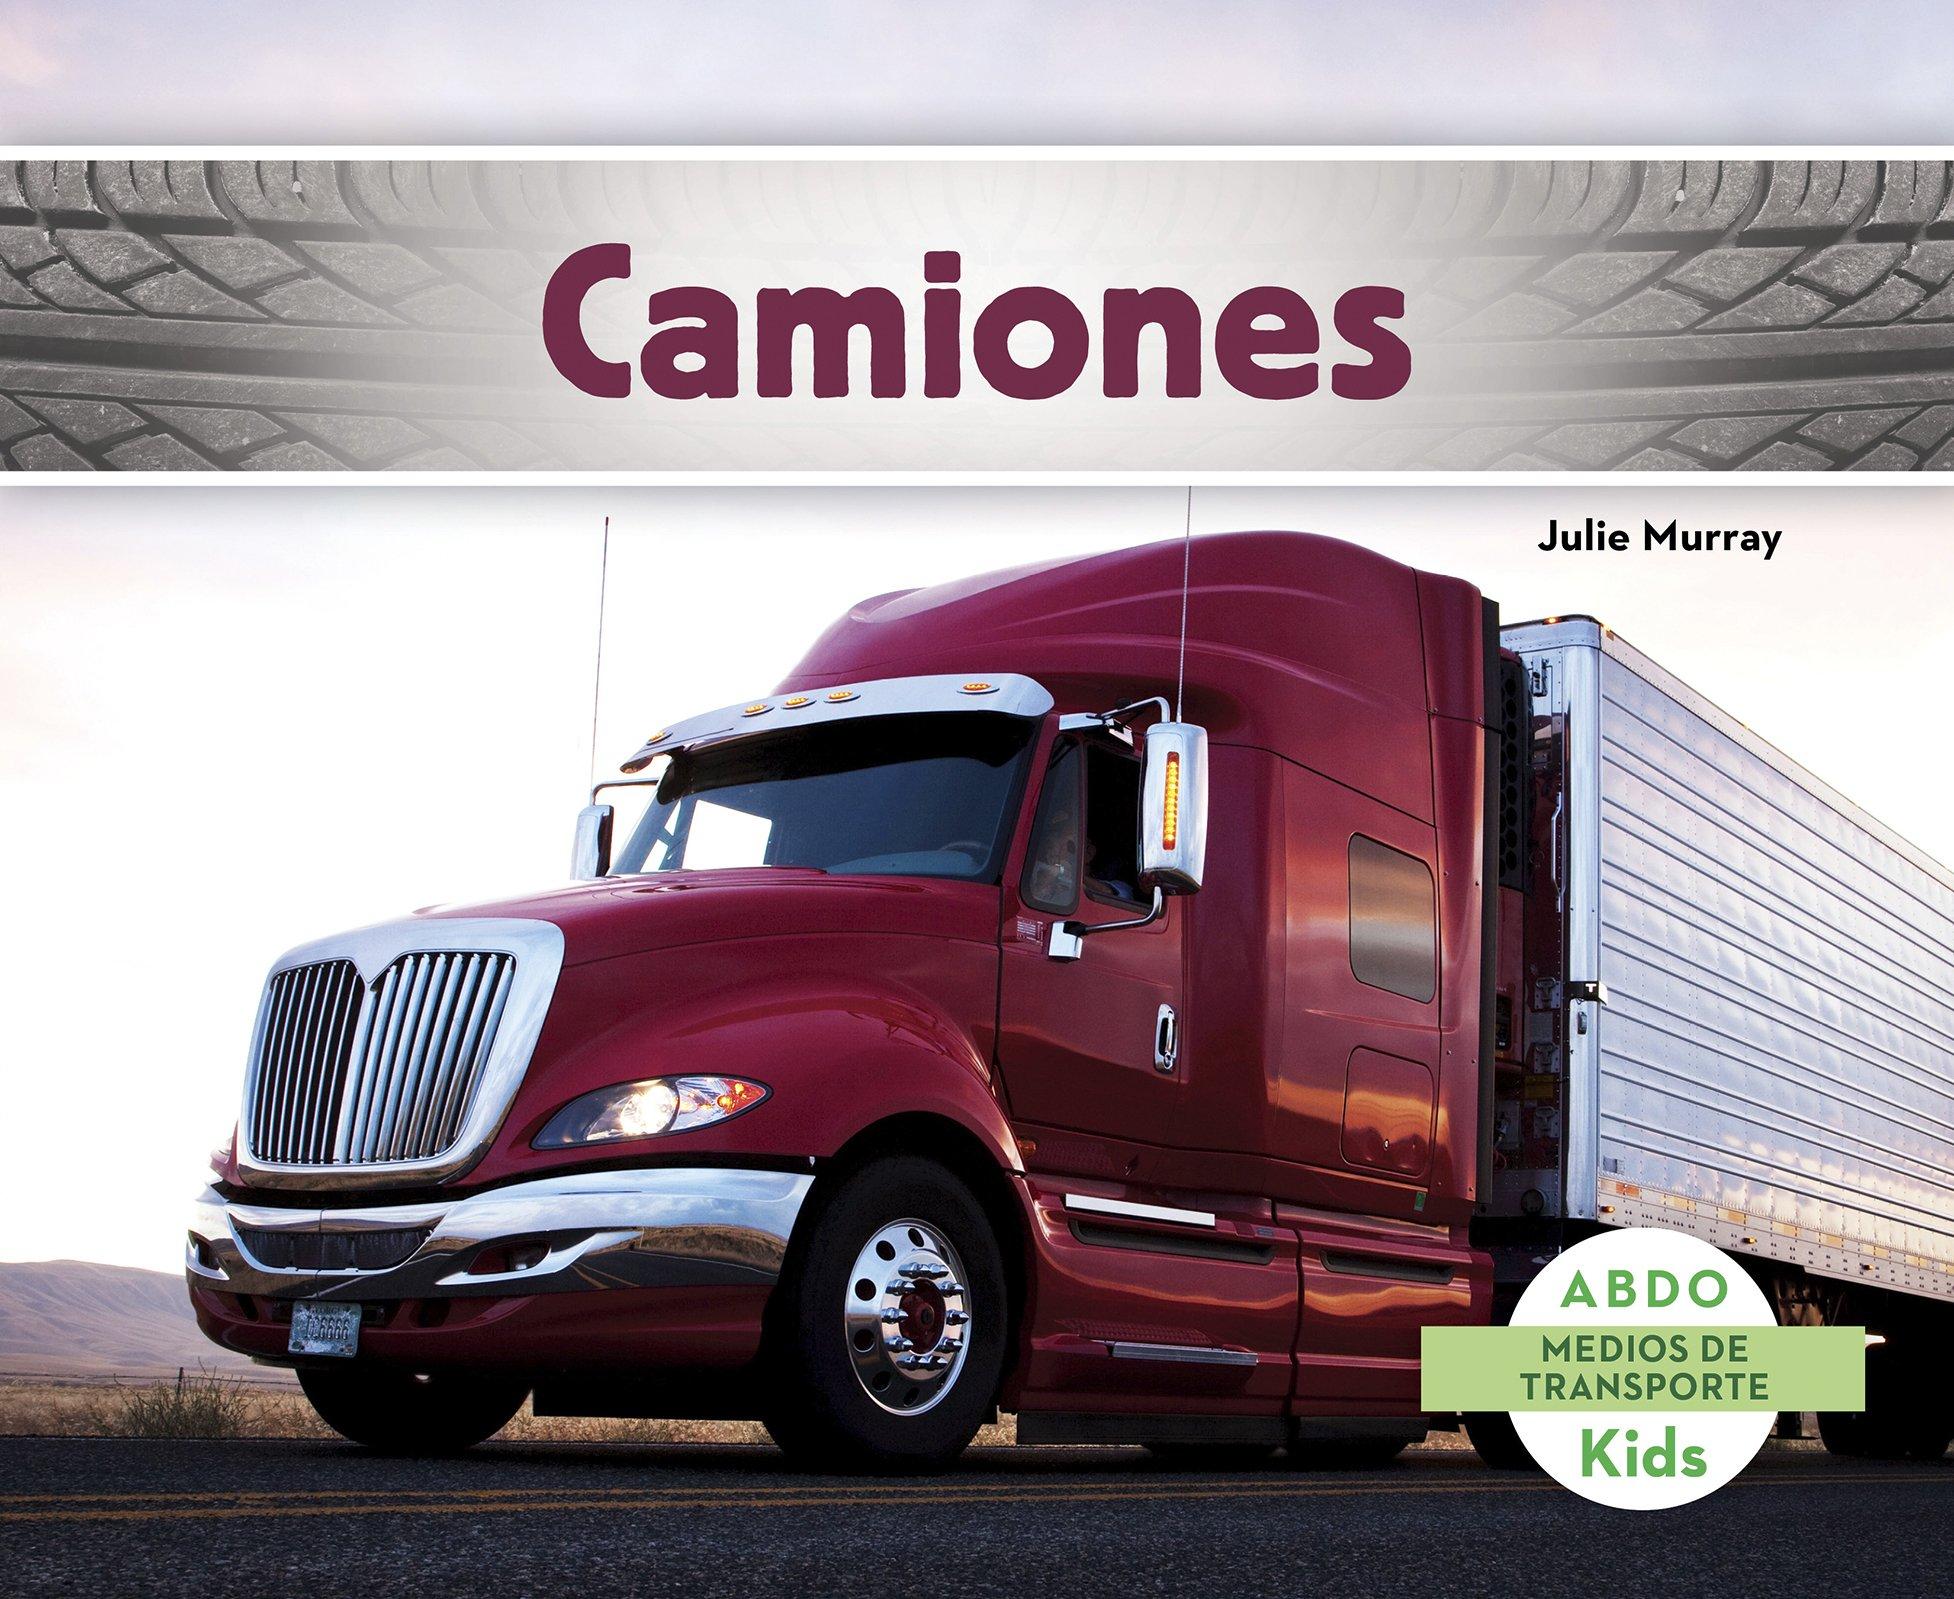 camiones-abdo-kids-medios-de-transporte-spanish-edition